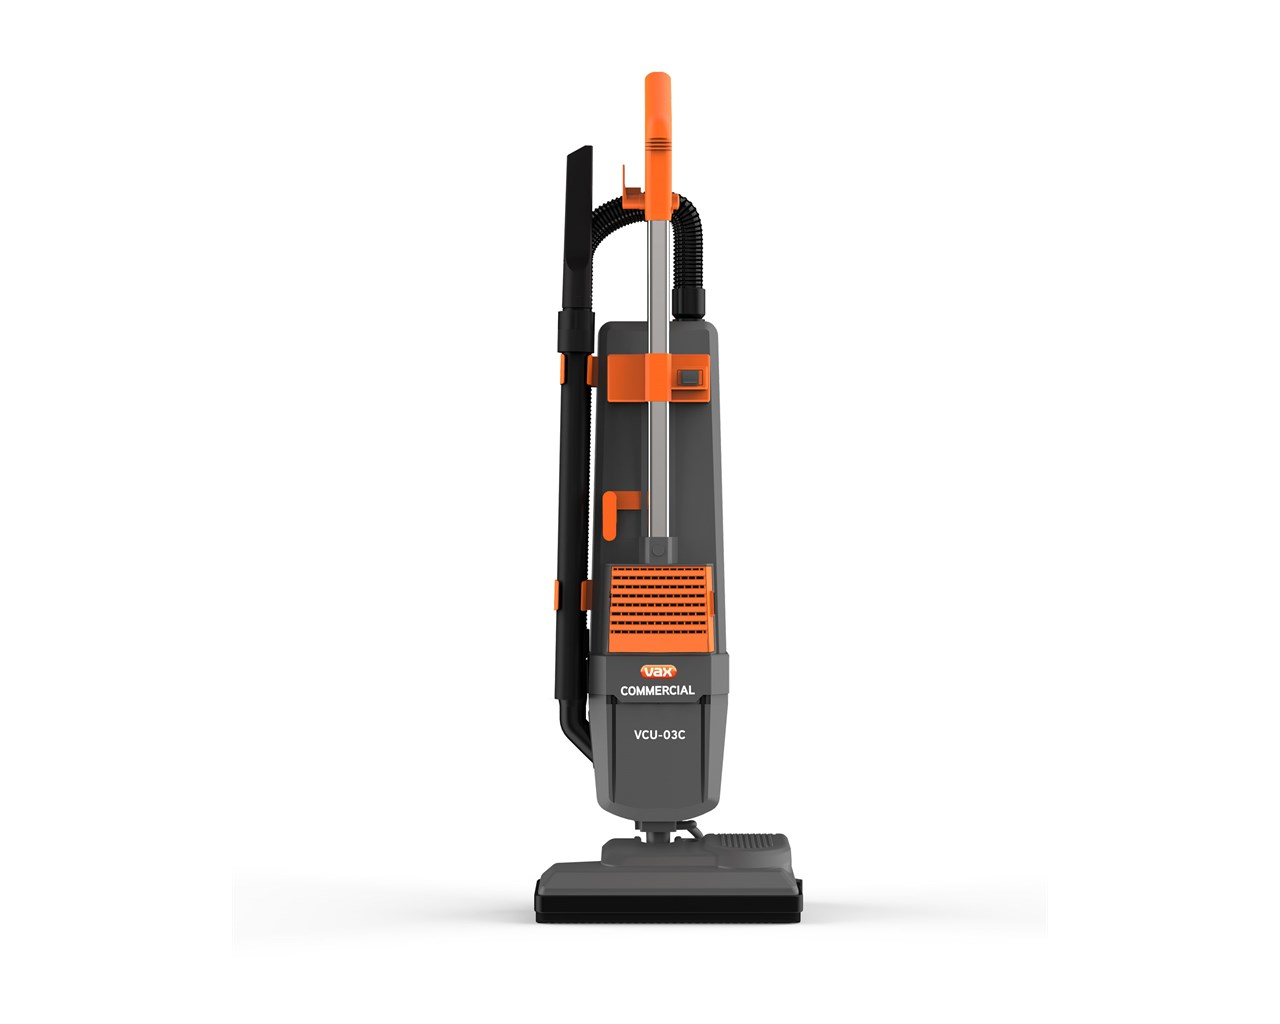 Vax Vcu 03c Upright Vacuum Cleaner 1000 Watt